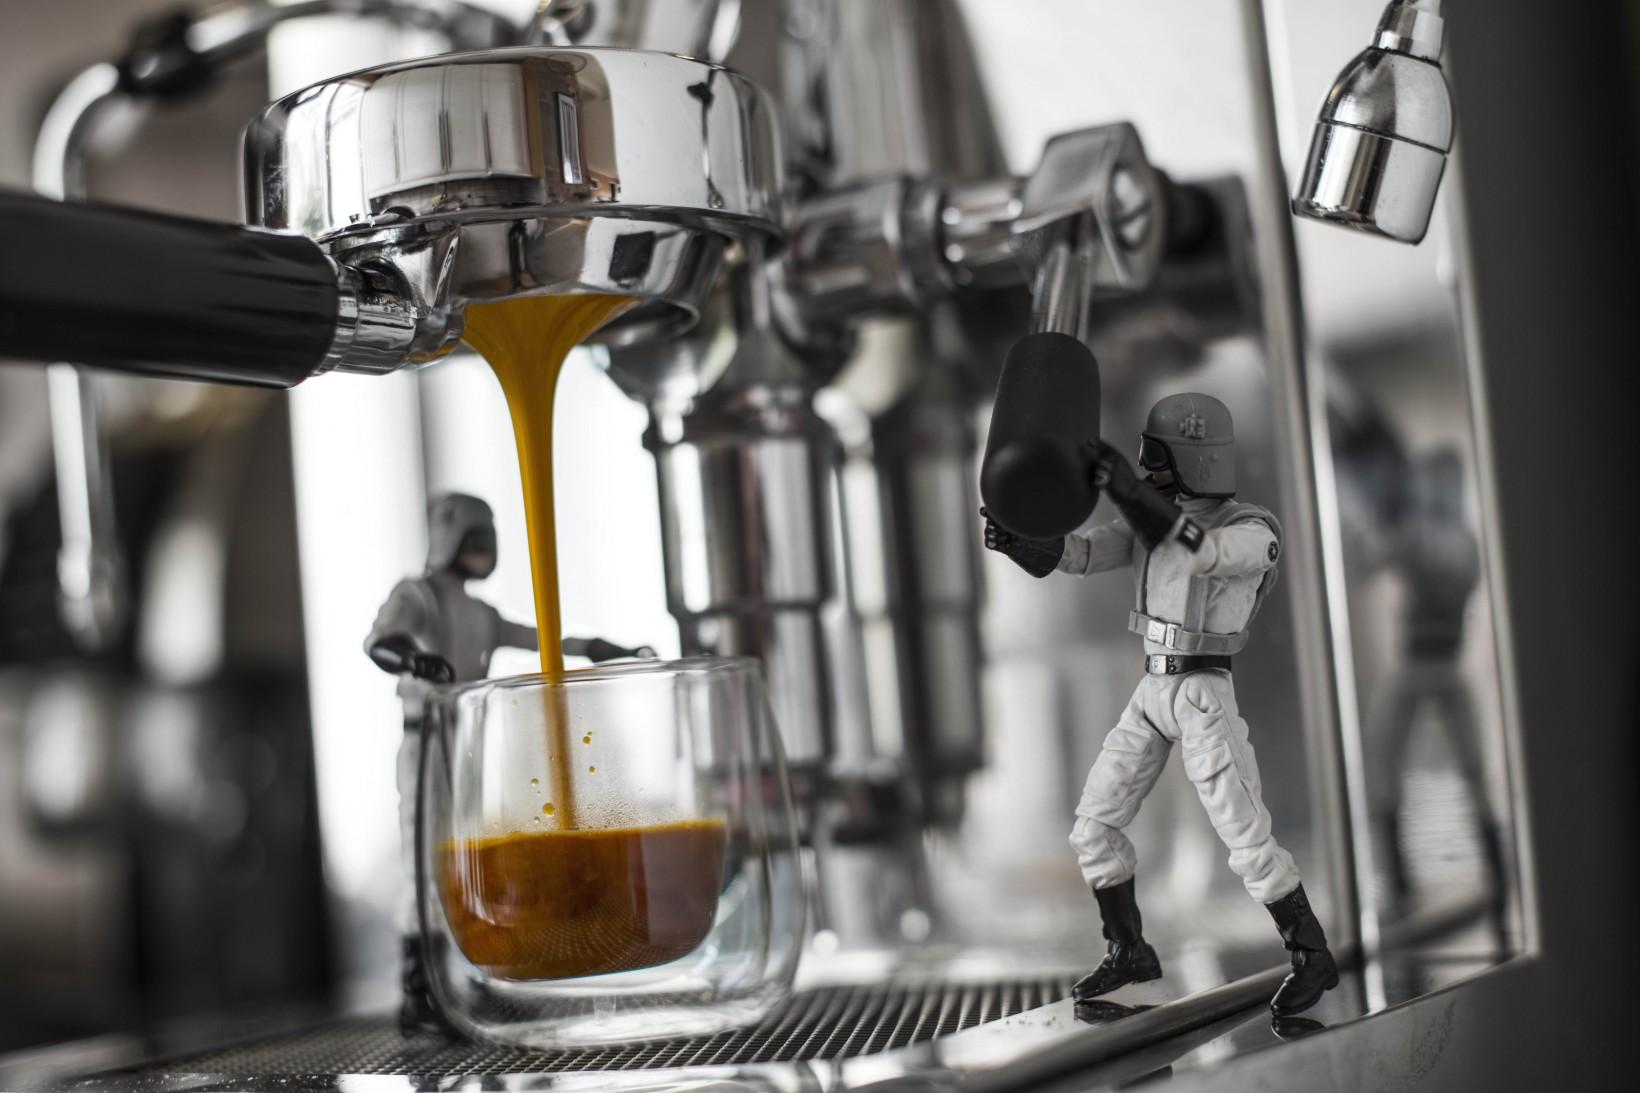 hustomteespresso